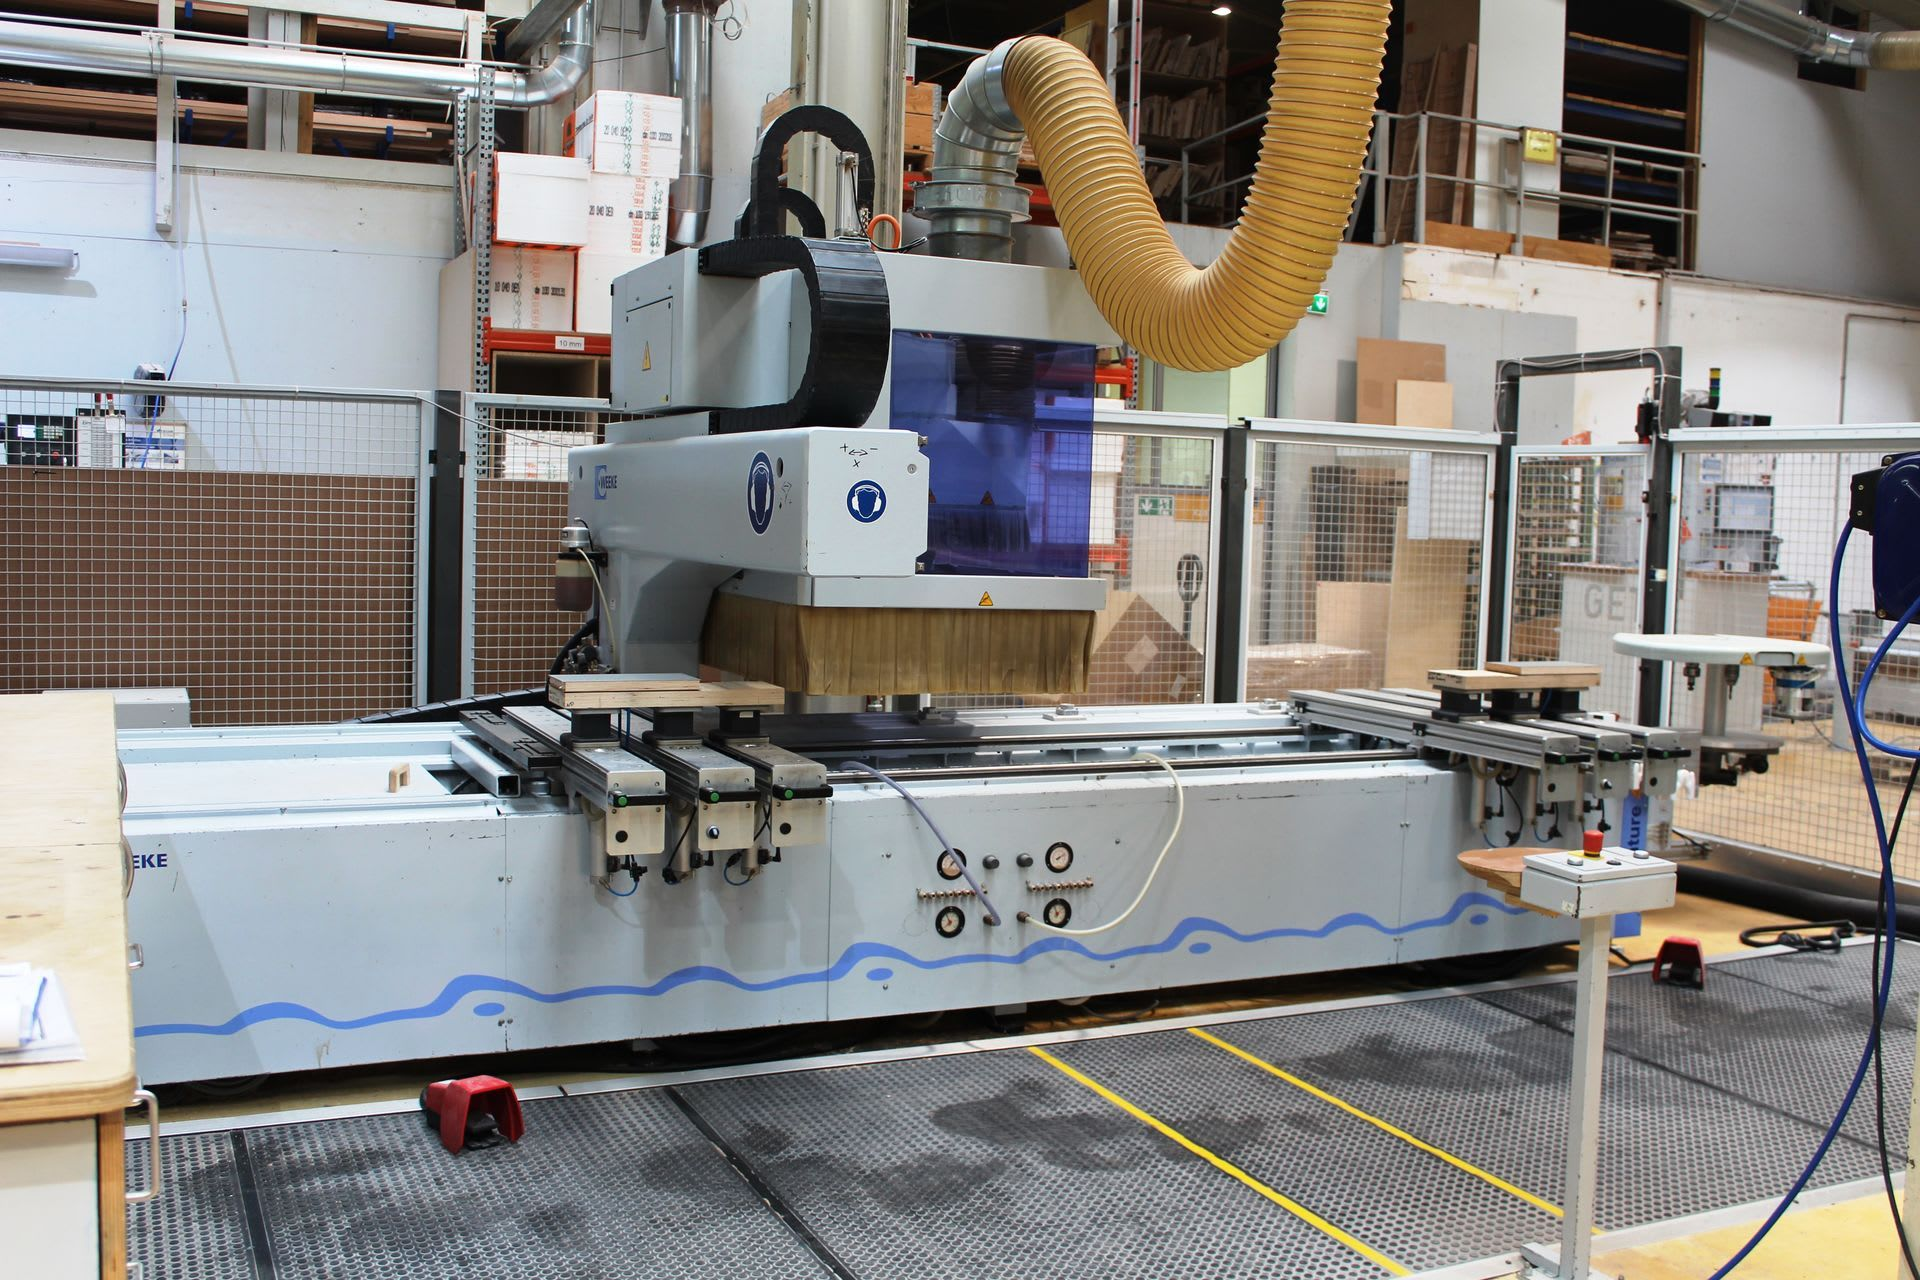 WEEKE Optimat BHC VENTURE 4 M CNC-Bearbeitungszentrum